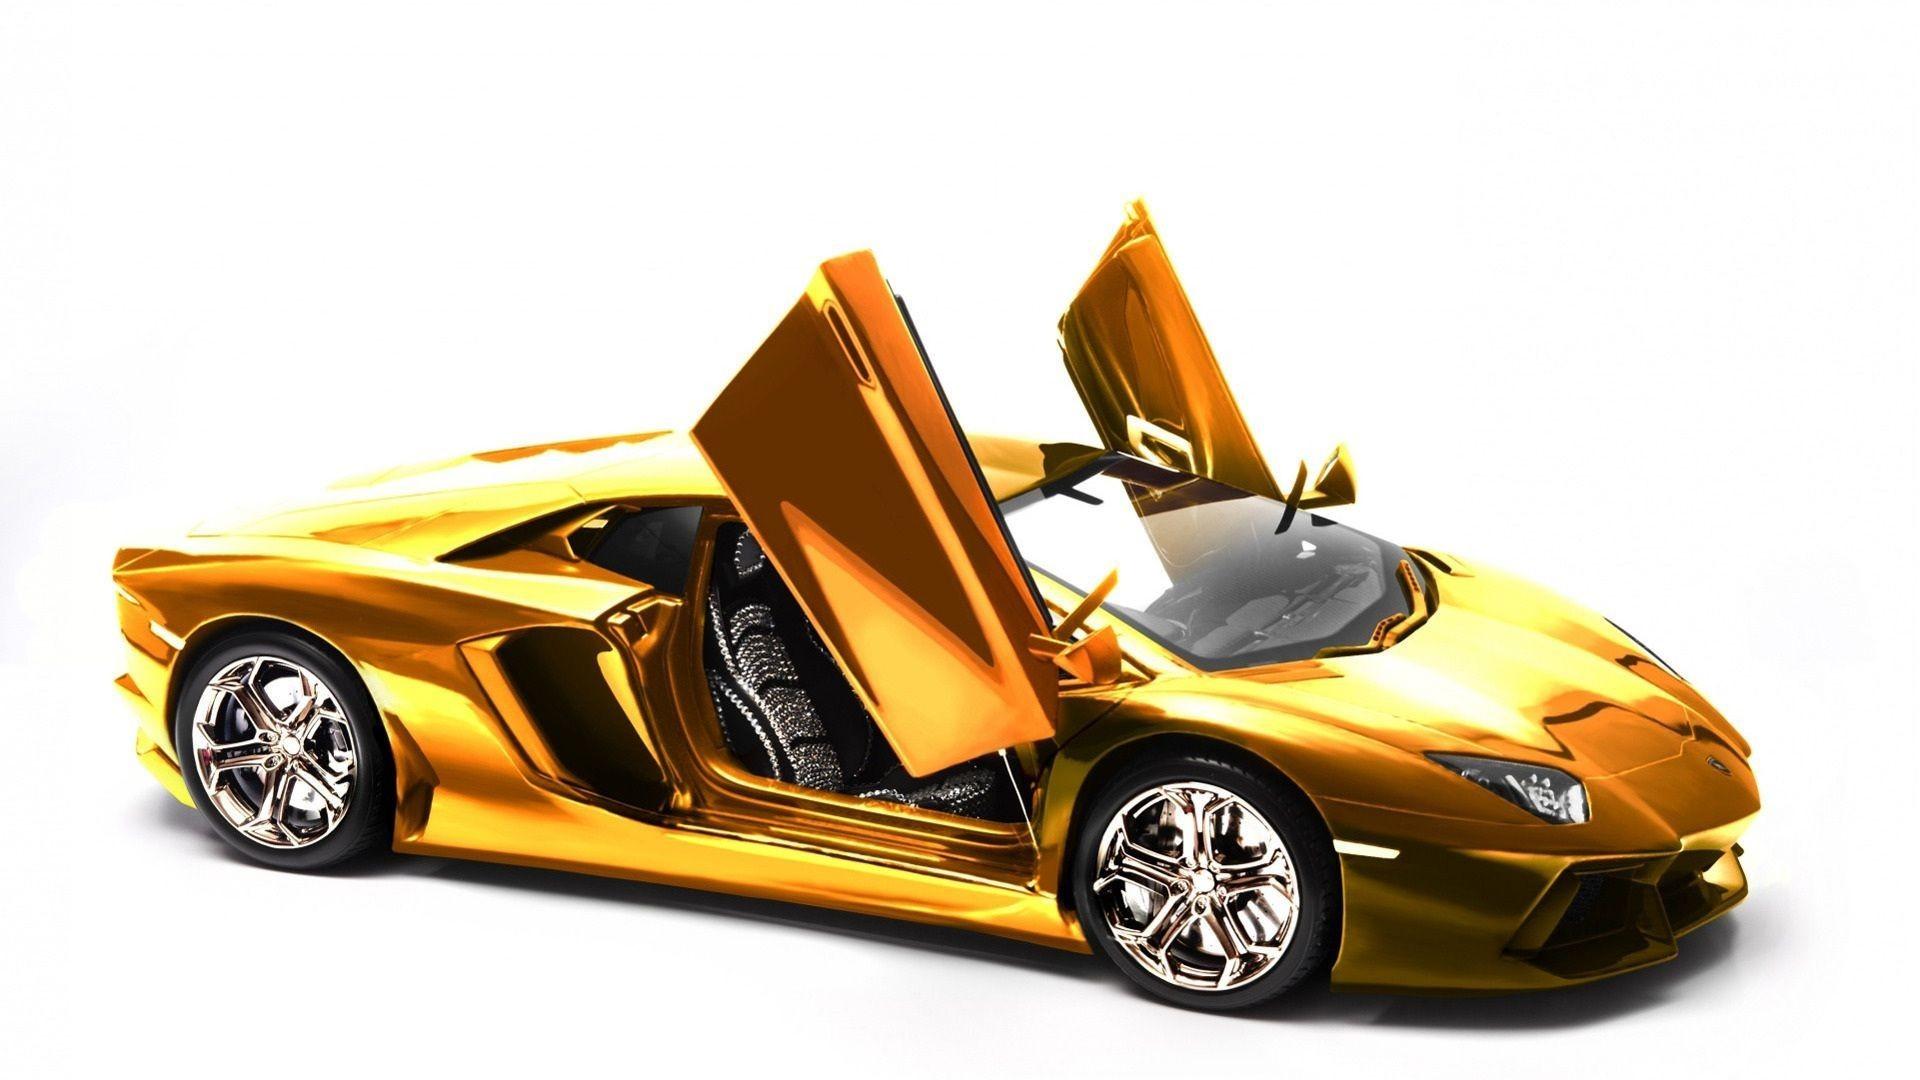 Blue Lamborghini Car Pictures & Images – Super Cool Blue Lambo .